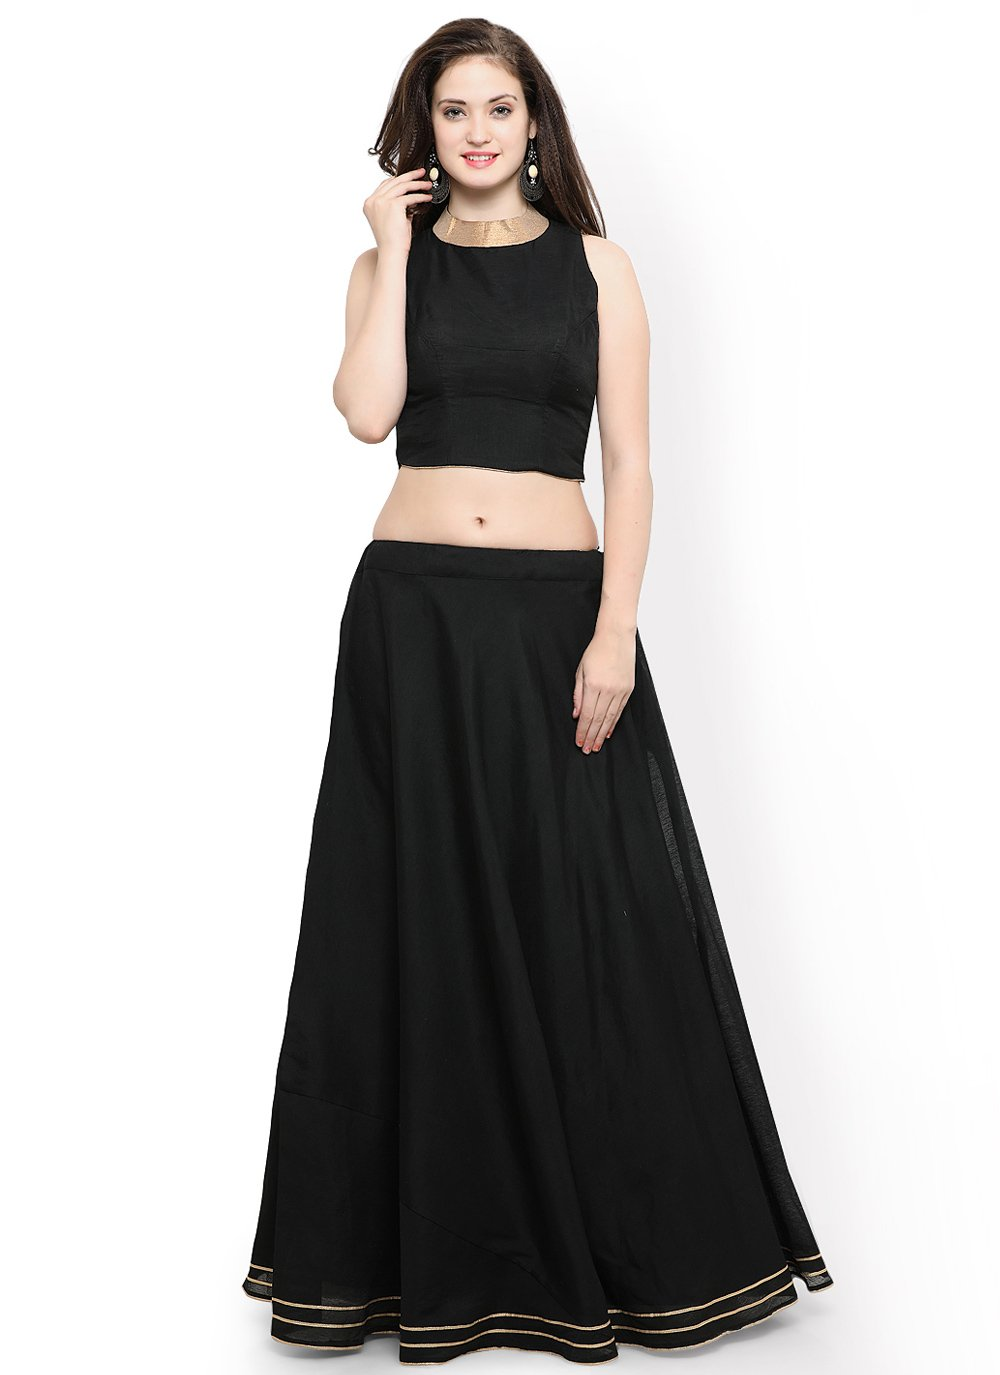 Readymade Lehenga Choli Plain Chanderi Cotton in Black